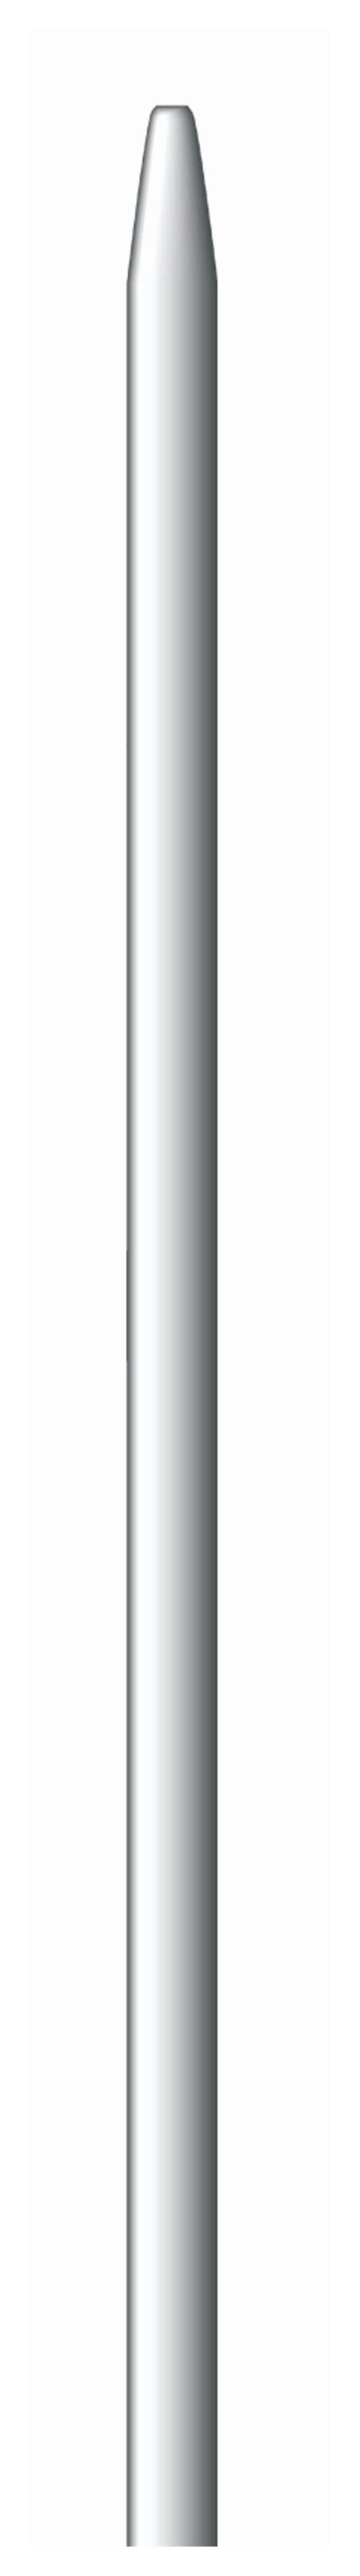 SGE™Aghi di ricambio per siringhe da 10 ul Needle length: 70mm; Gauge: 26; O.D.: 0.47mm; I.D.: 0.11mm; Tip style: cone; 2/Pk. SGE™Aghi di ricambio per siringhe da 10 ul